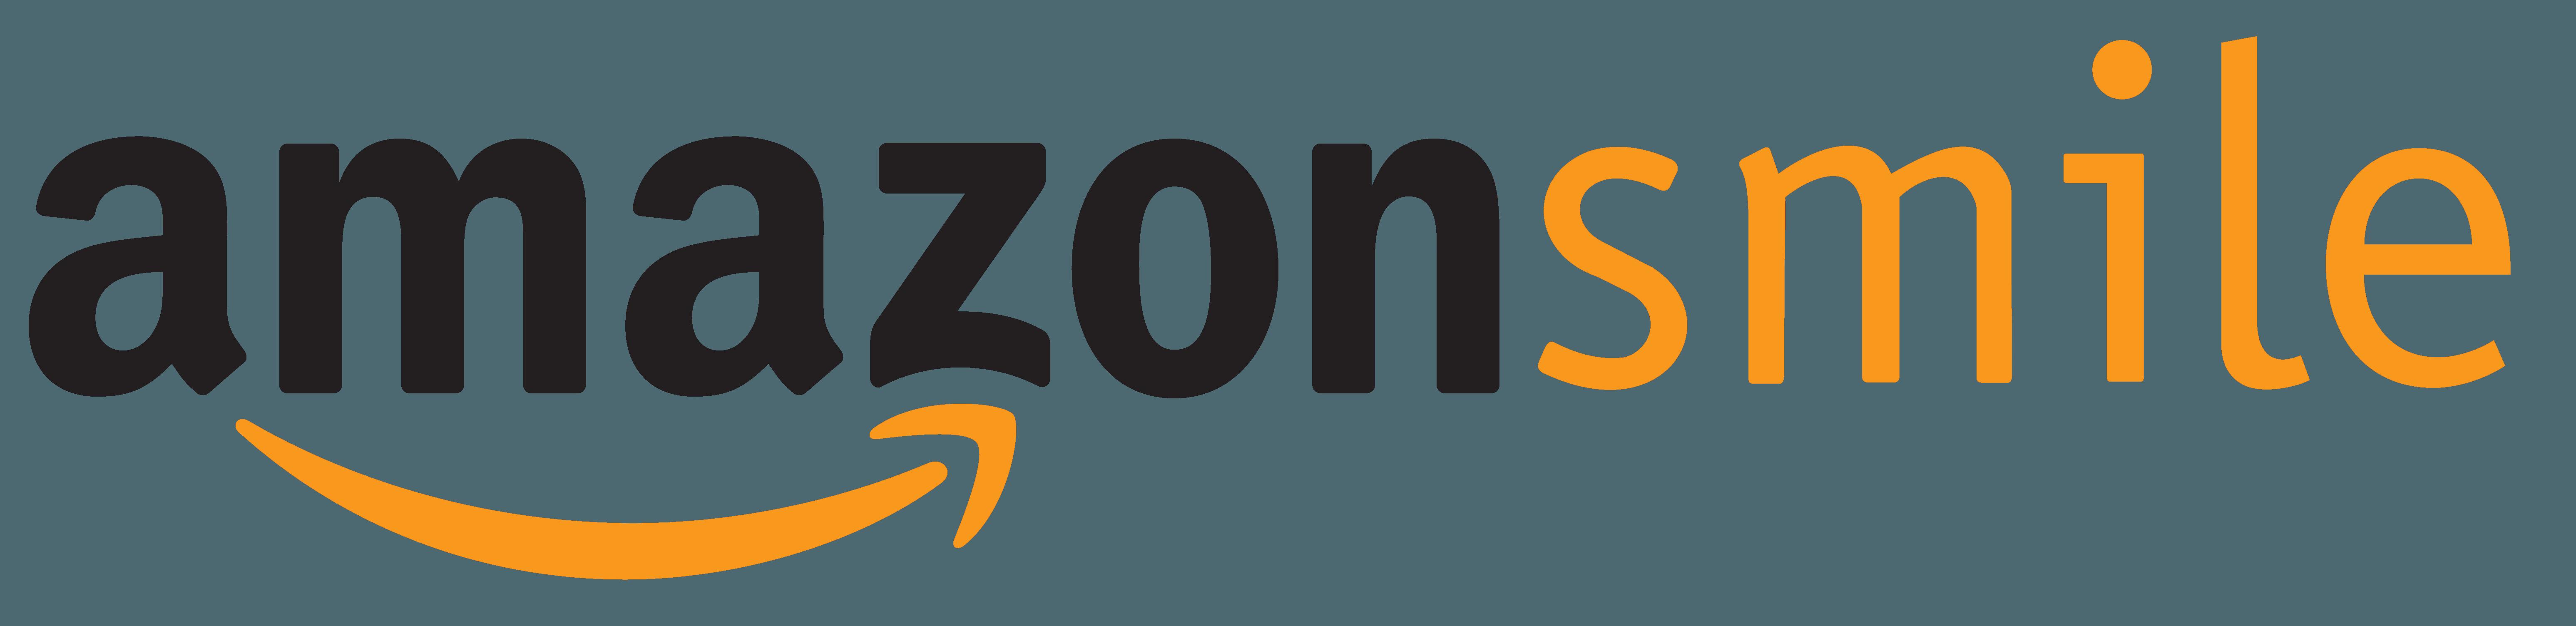 amazon logistics paketverfolgung